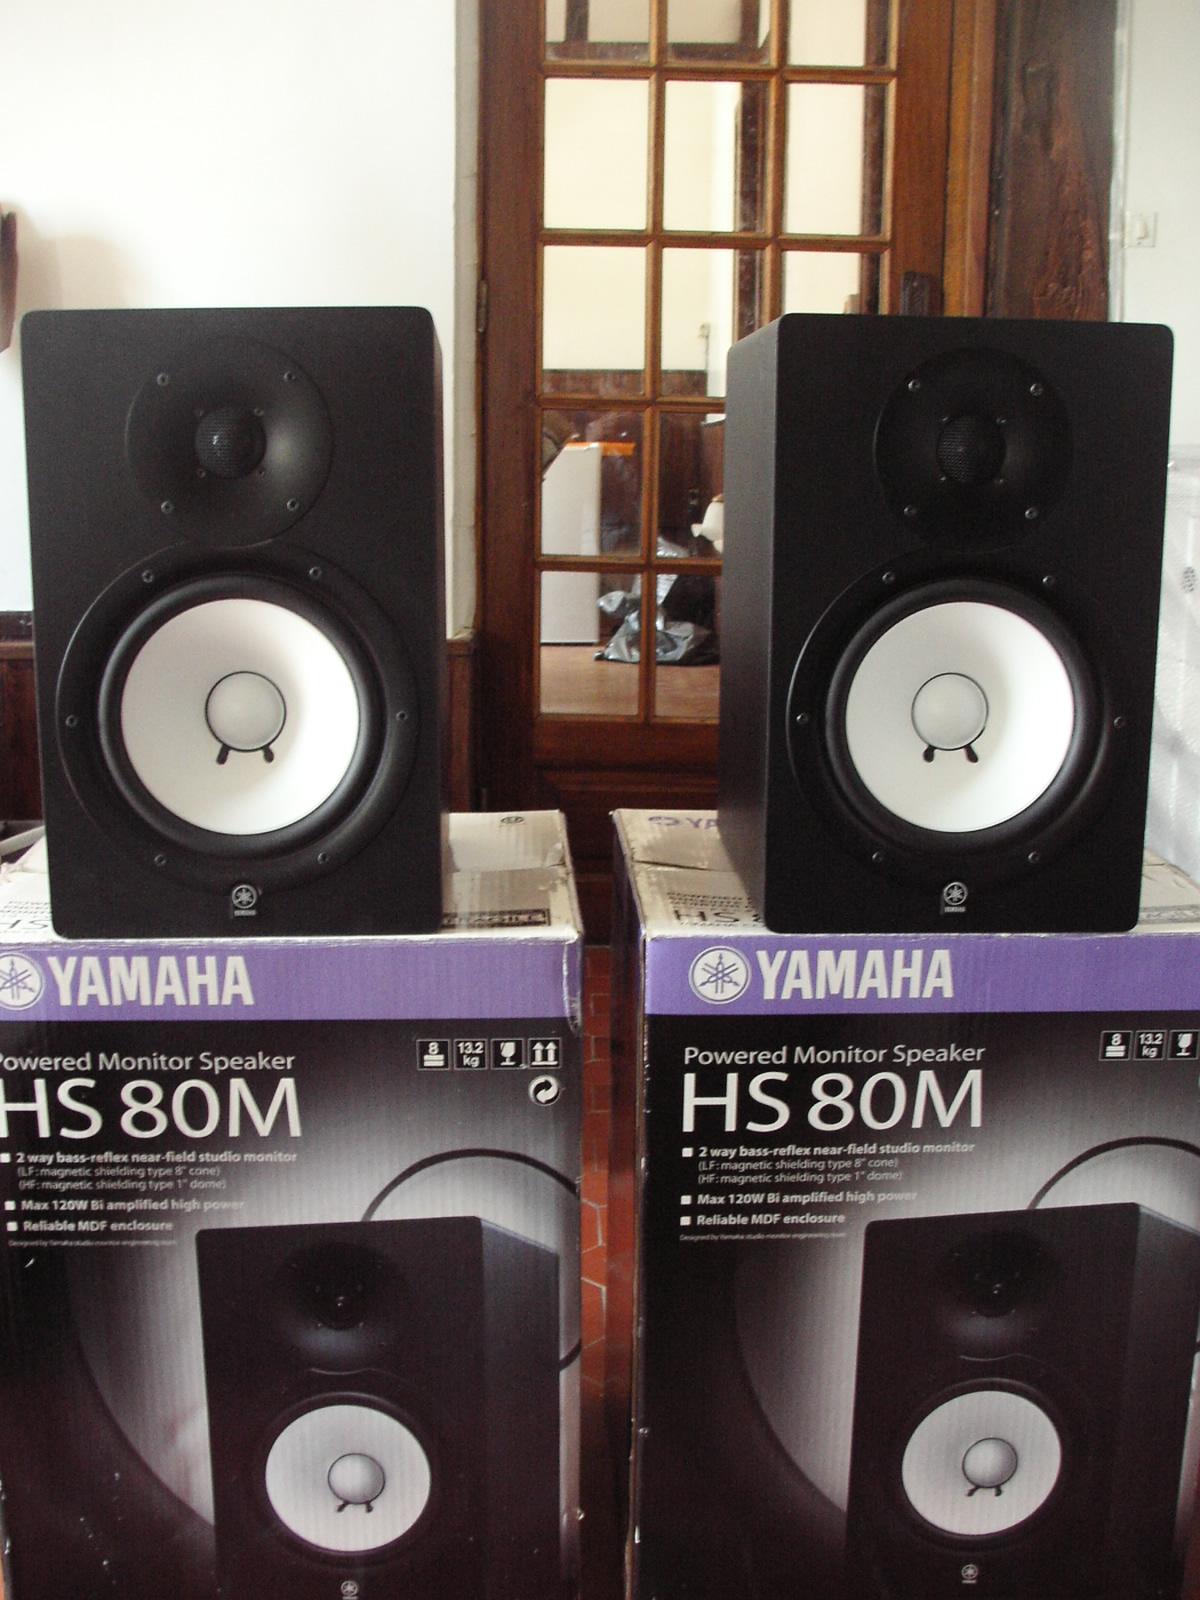 yamaha hs80m image 373996 audiofanzine. Black Bedroom Furniture Sets. Home Design Ideas